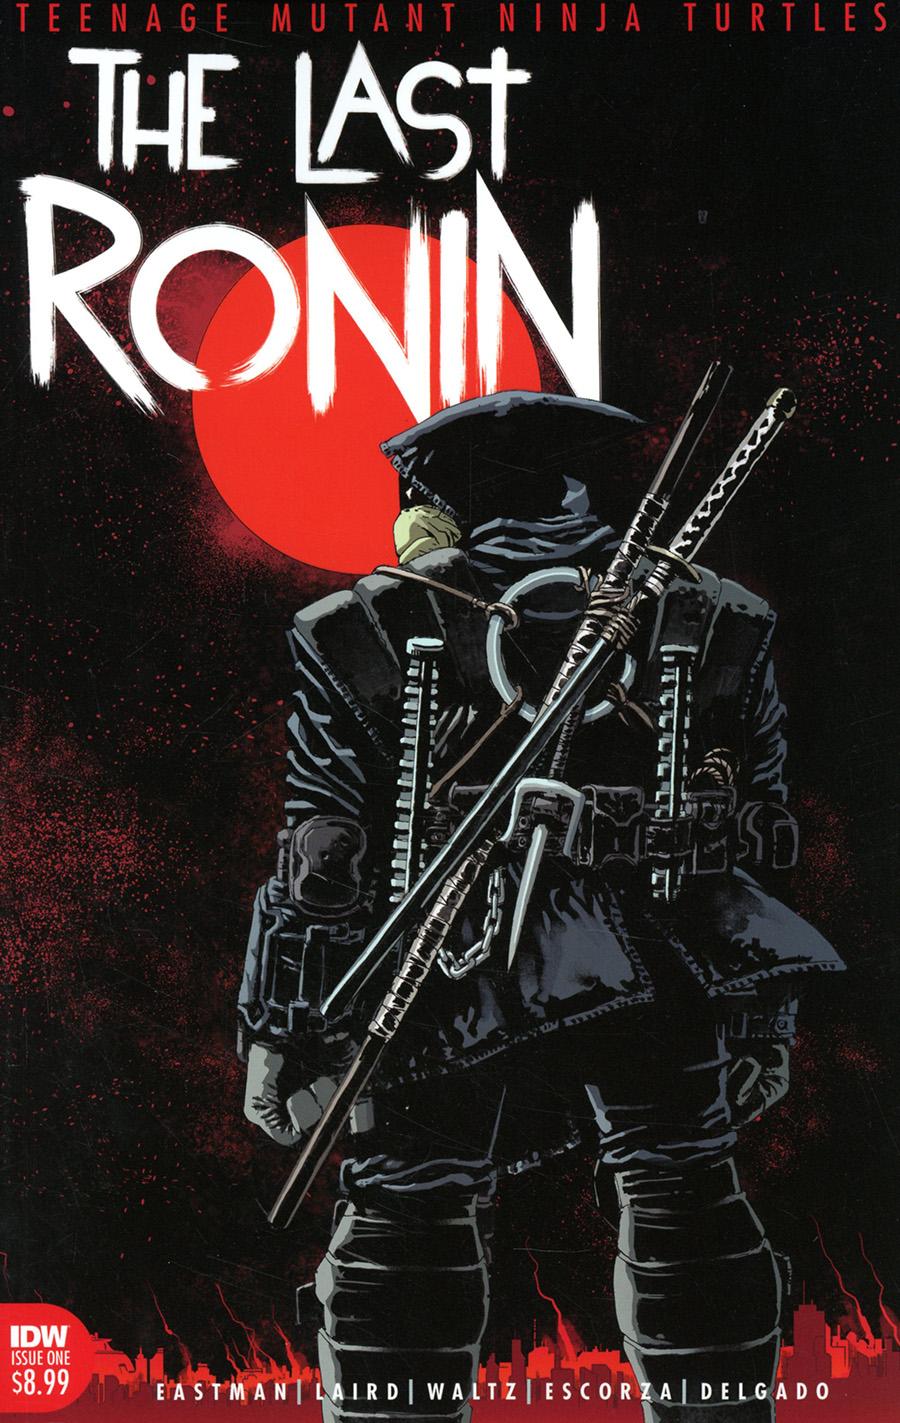 Teenage Mutant Ninja Turtles Last Ronin #1 Cover A Regular Andy Kuhn & Kevin Eastman Cover